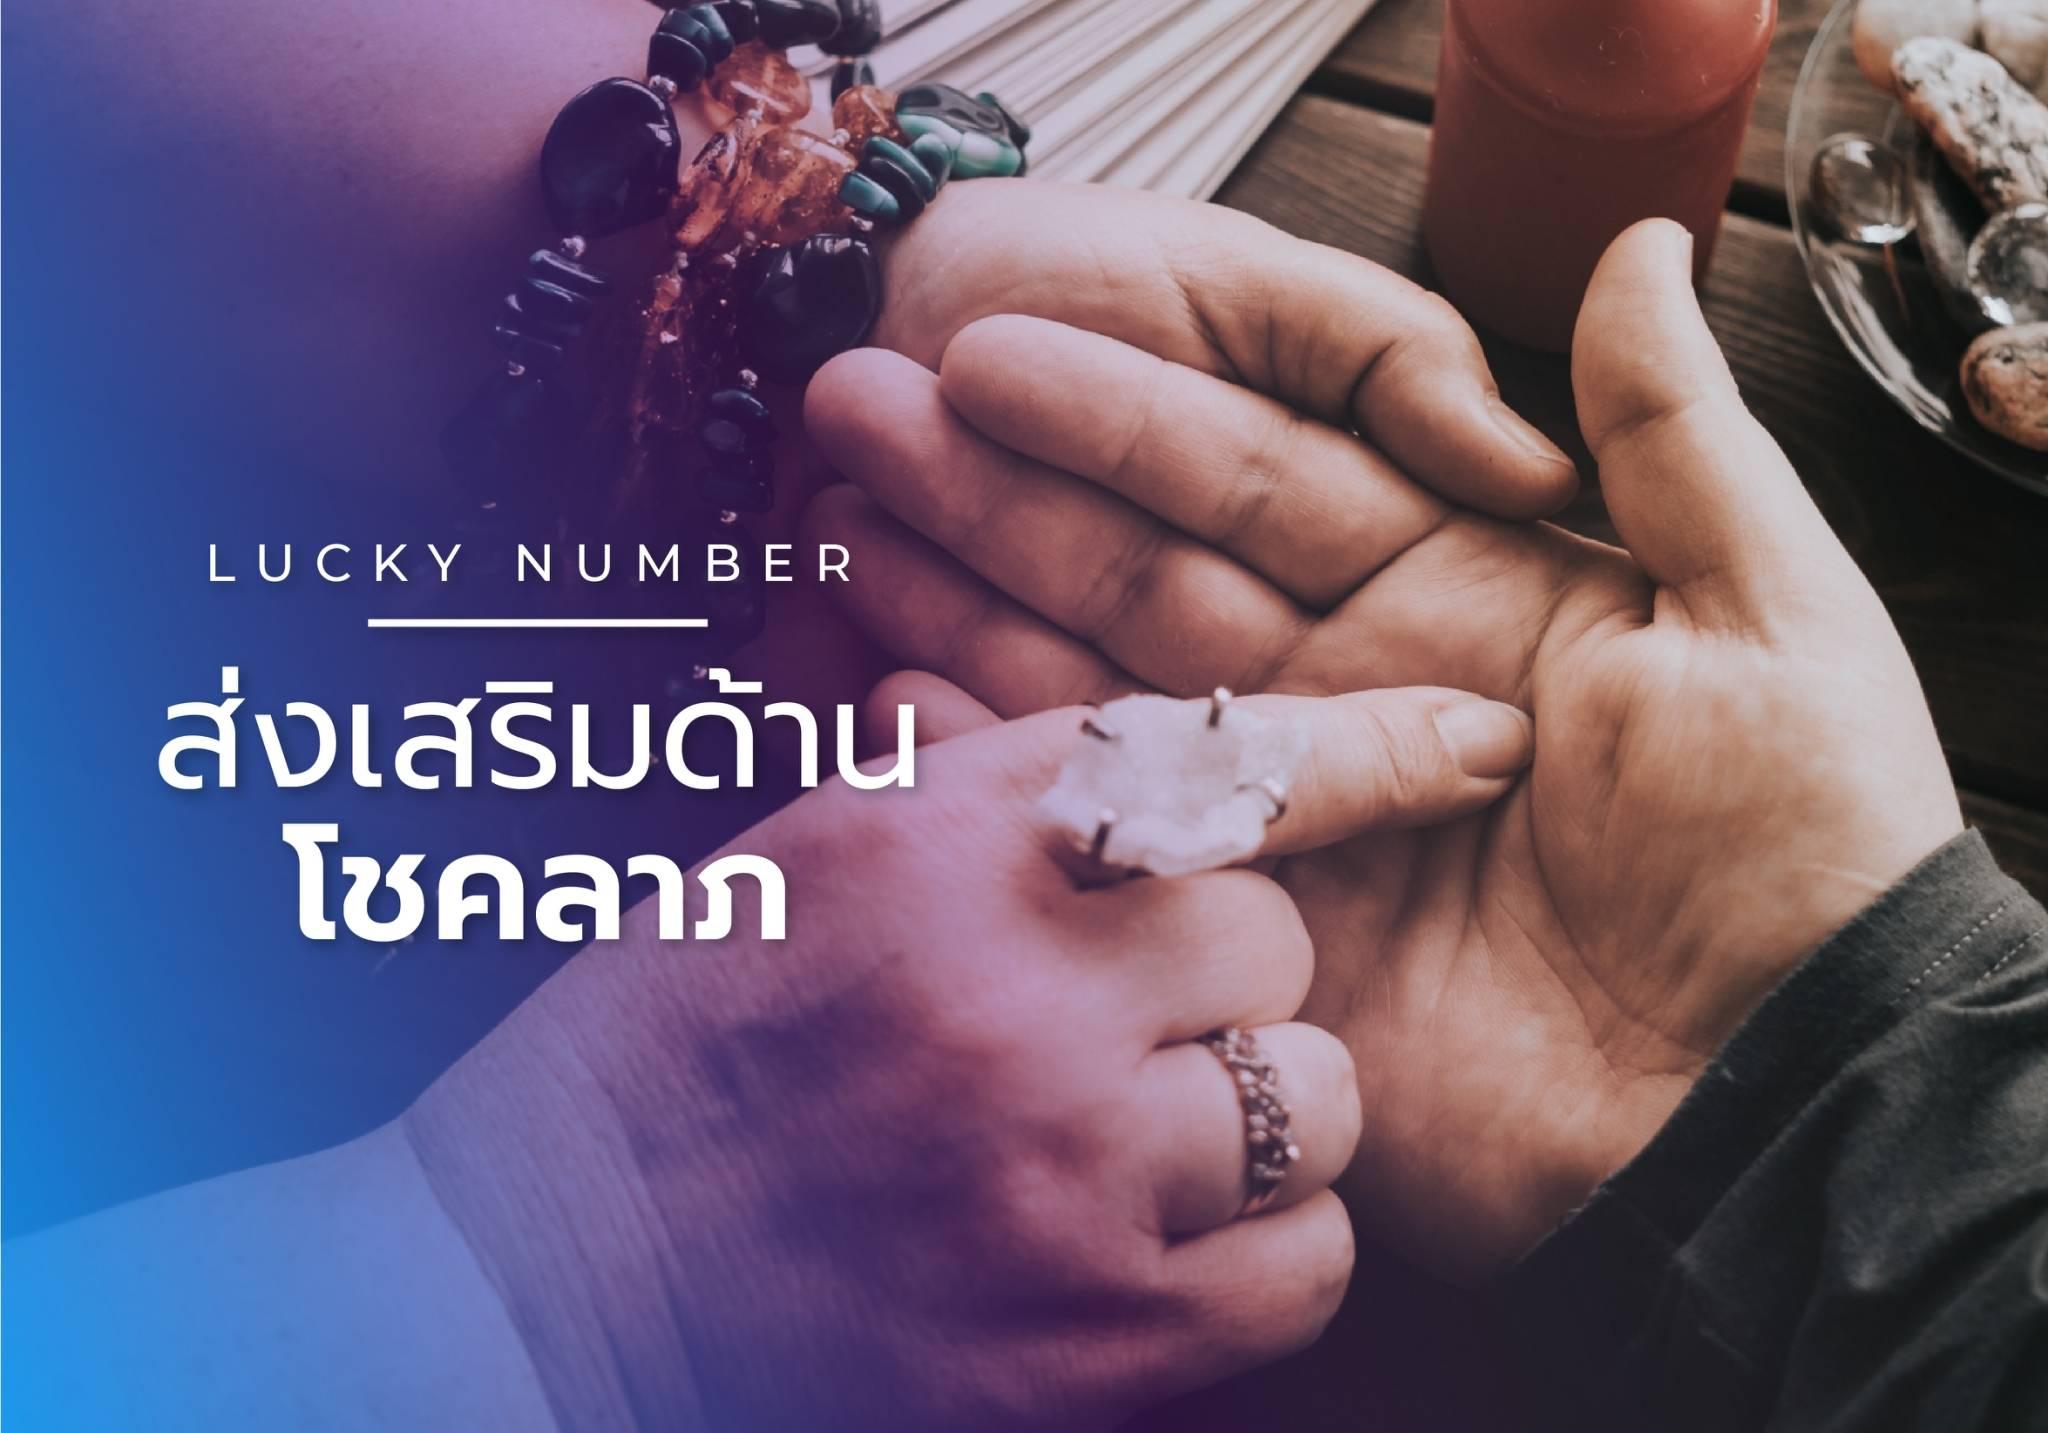 lucky namber-lucky